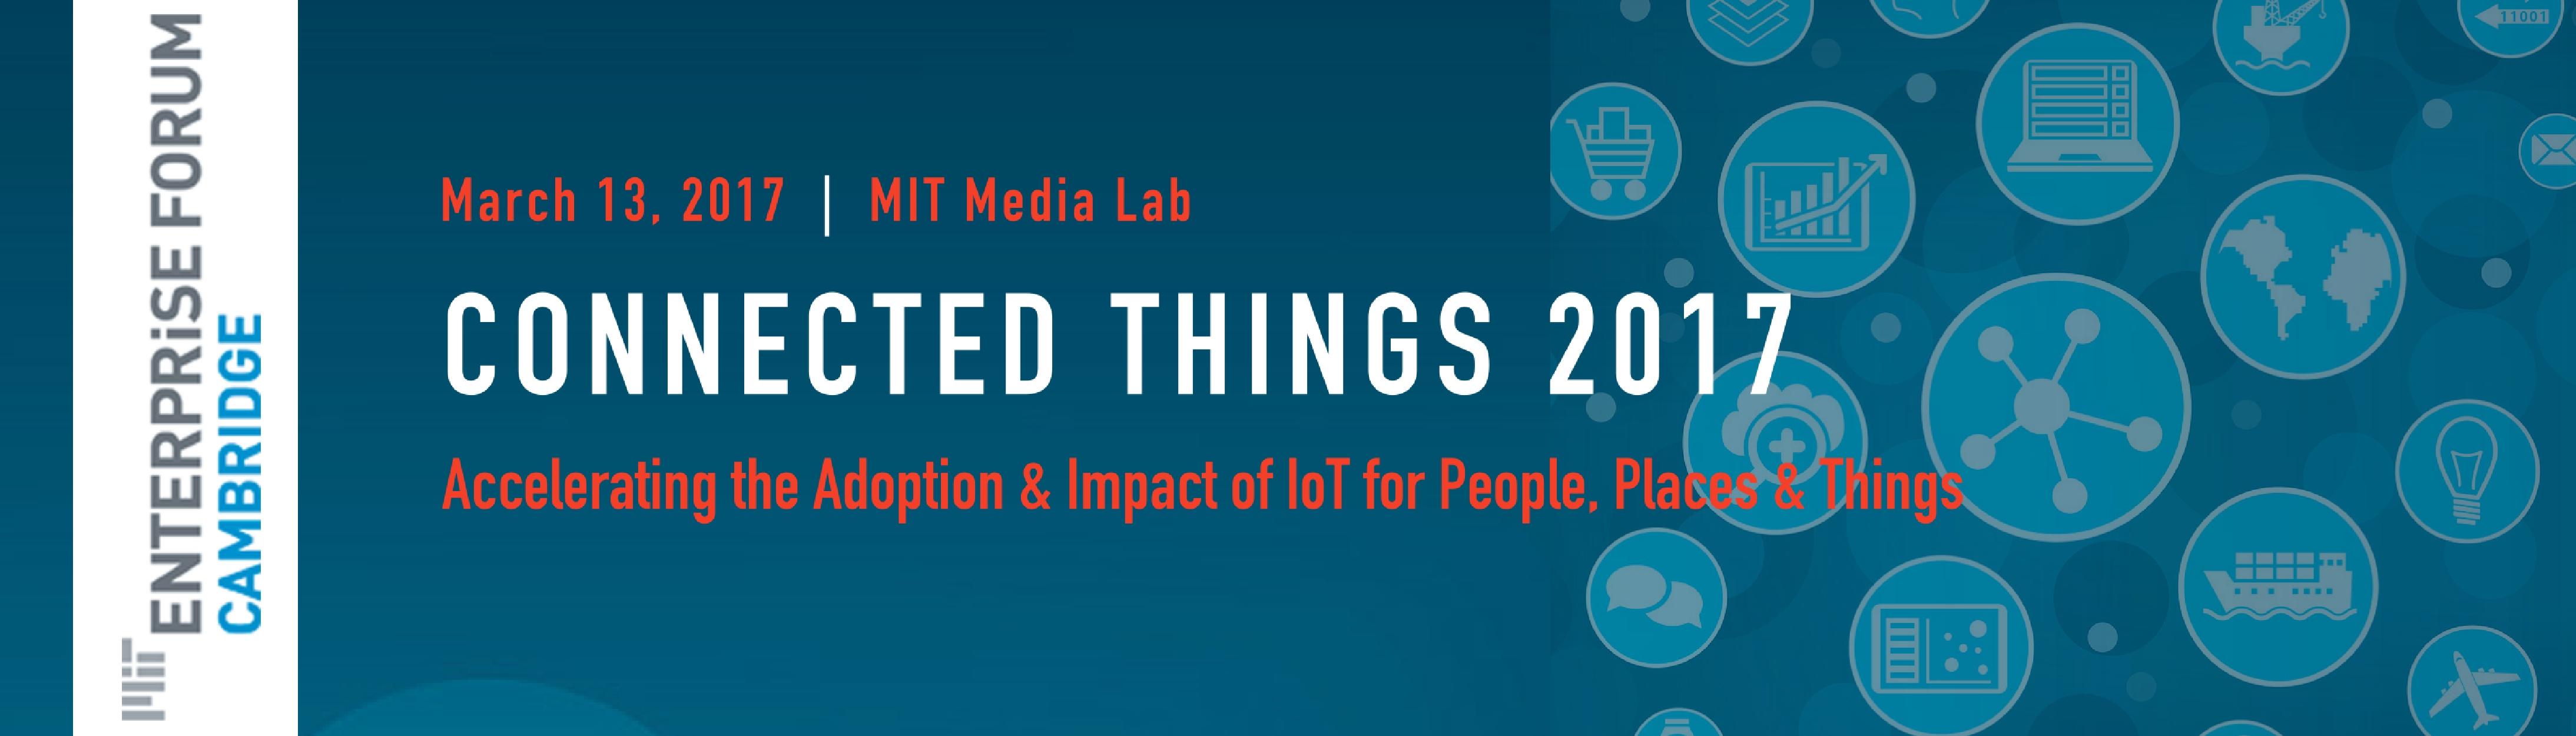 Connected Things 2017 - MIT Enterprise Forum of Cambridge